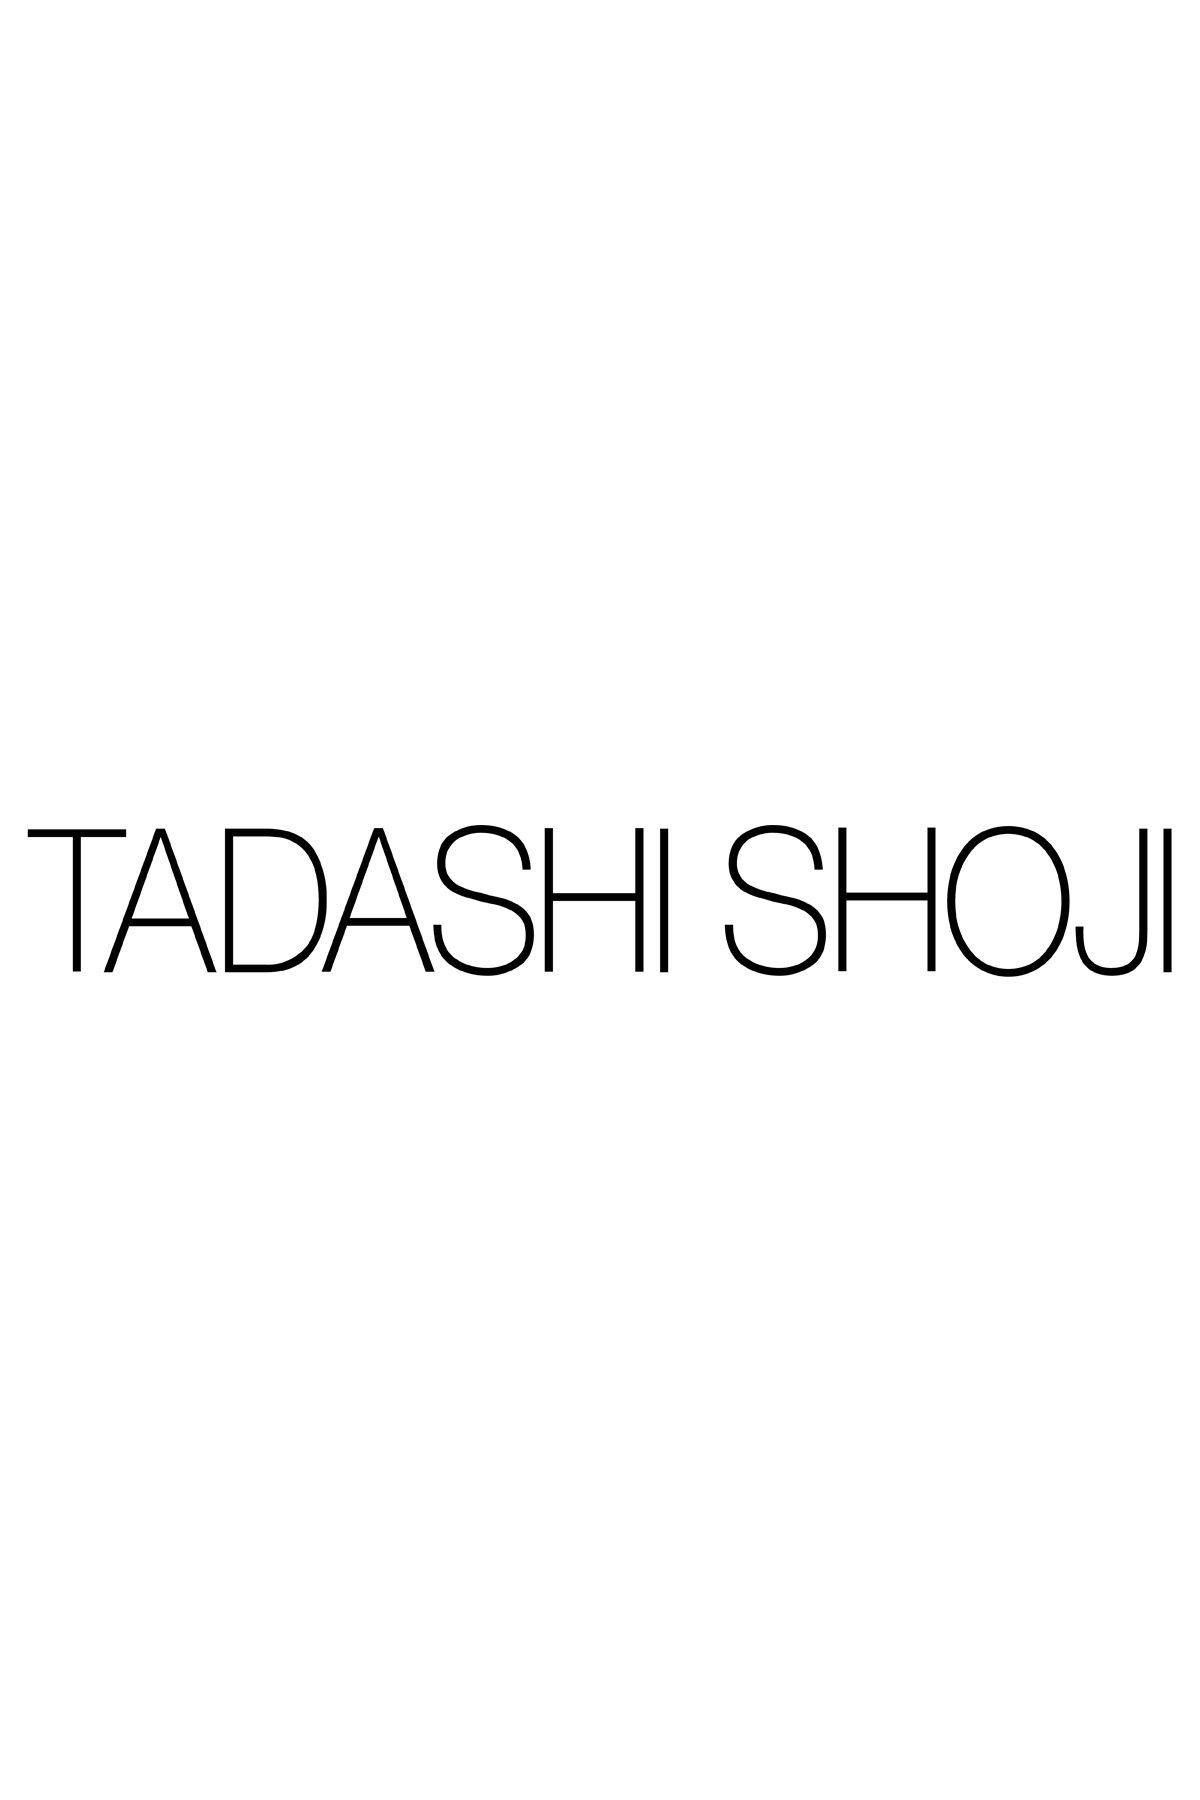 Tadashi Shoji Plus Size Detail - Corded Embroidery on Tulle Cap Sleeve Dress